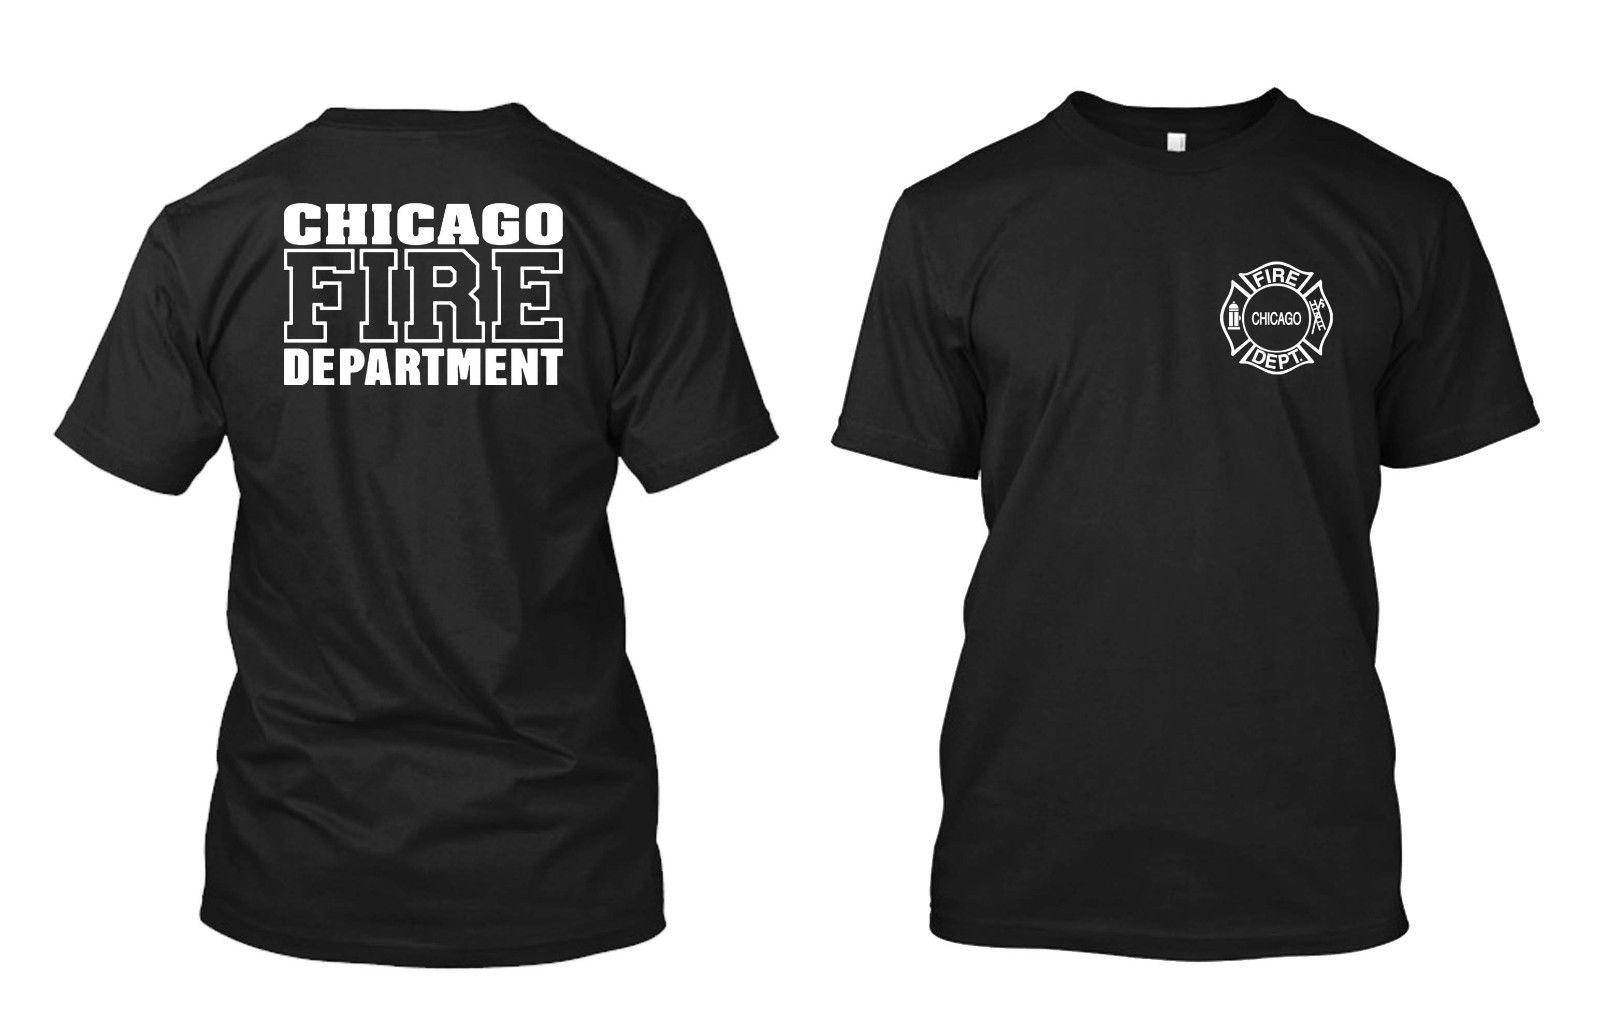 Hot Sale Men T Shirt Fashion Chicago Fire Department - Custom Men's Black T-Shirt Tee Summer T-shirt